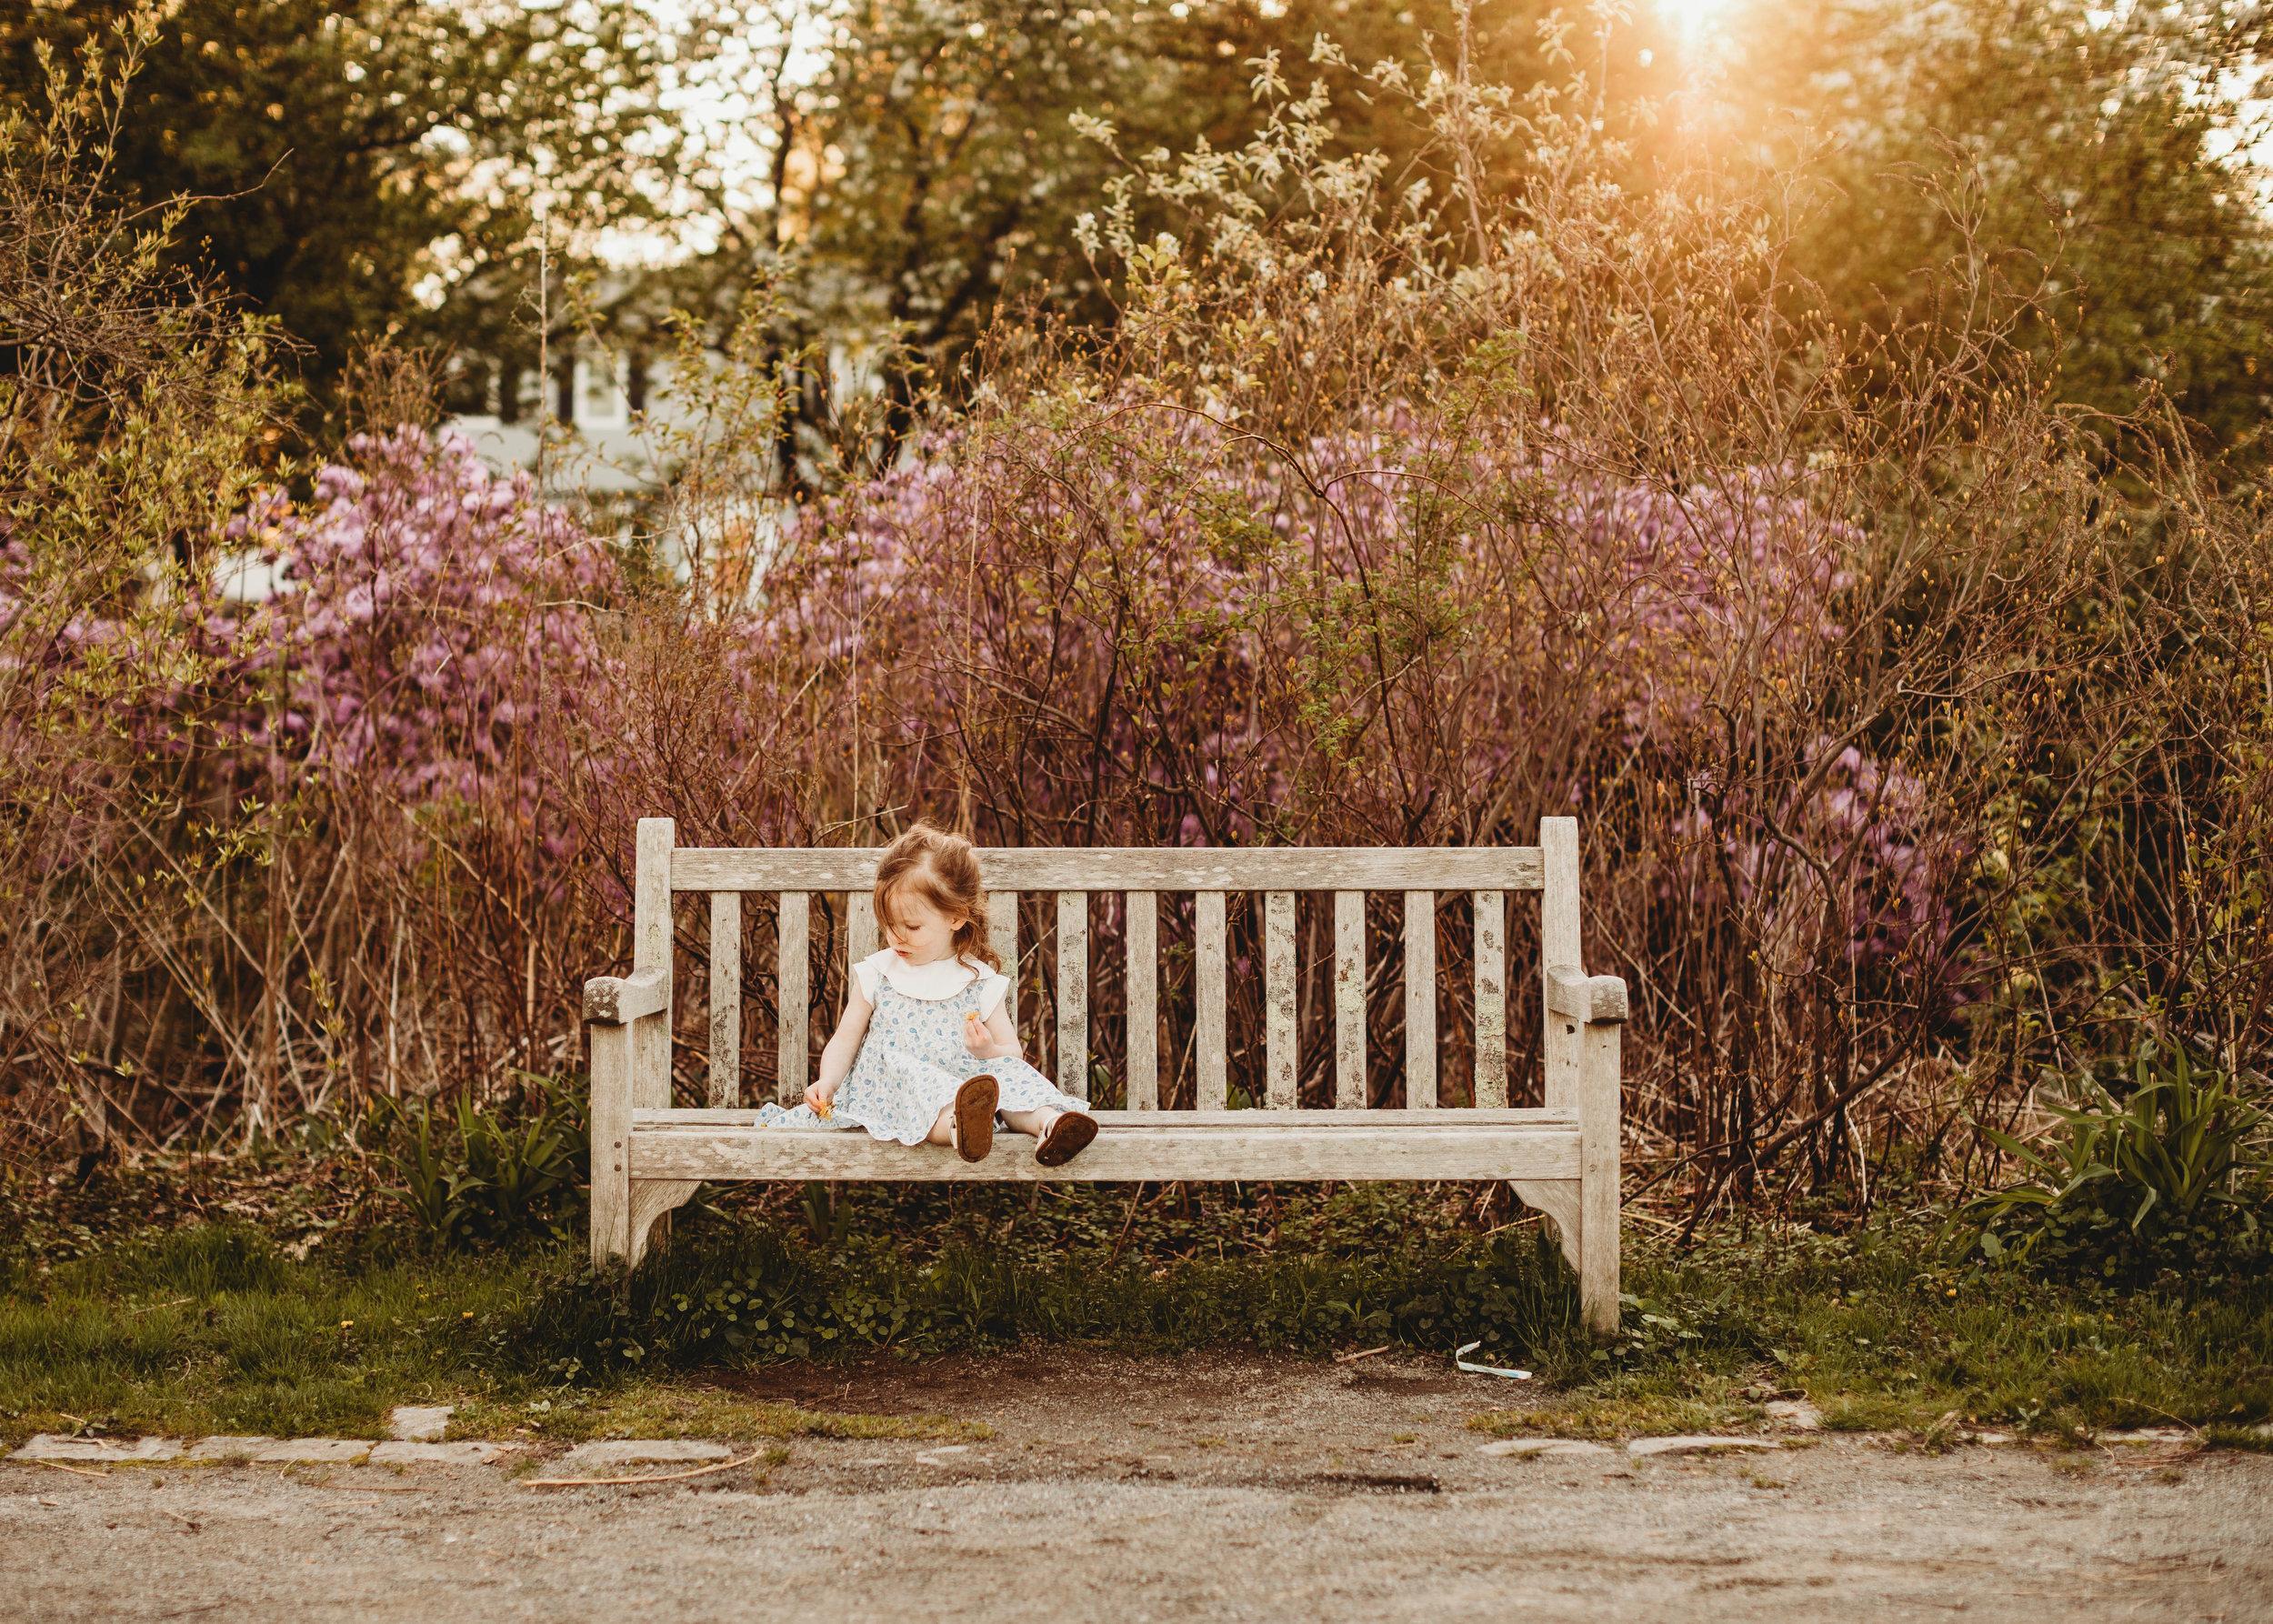 Capturing all the sweet springtime light. Cousins photo shoot. Golden hour at Acton Arboretum. Greater Boston photographer Joy LeDuc.